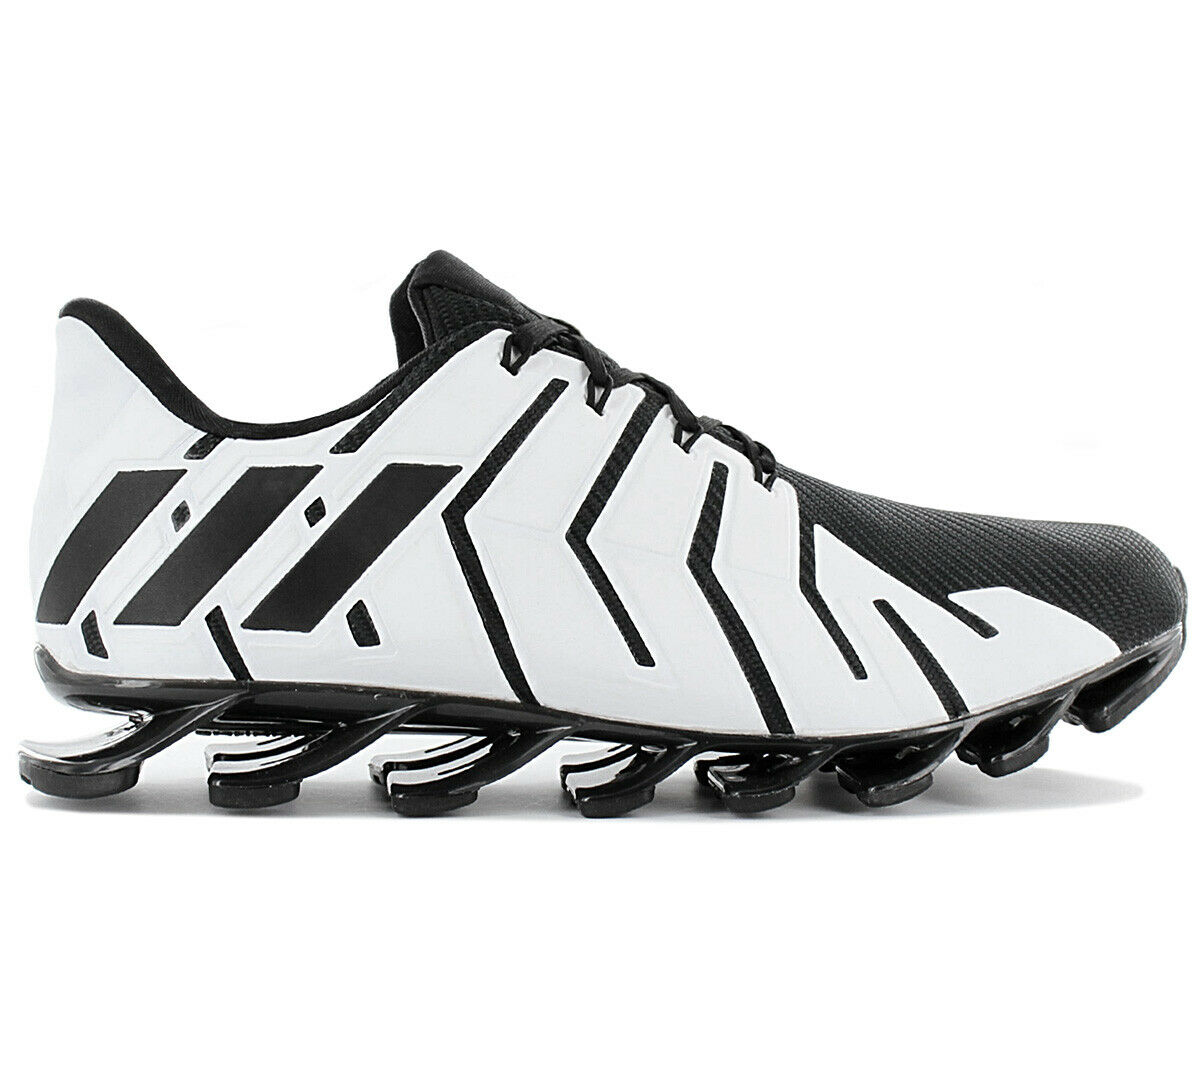 Adidas Pure Boost DPR Análisis a fondo en